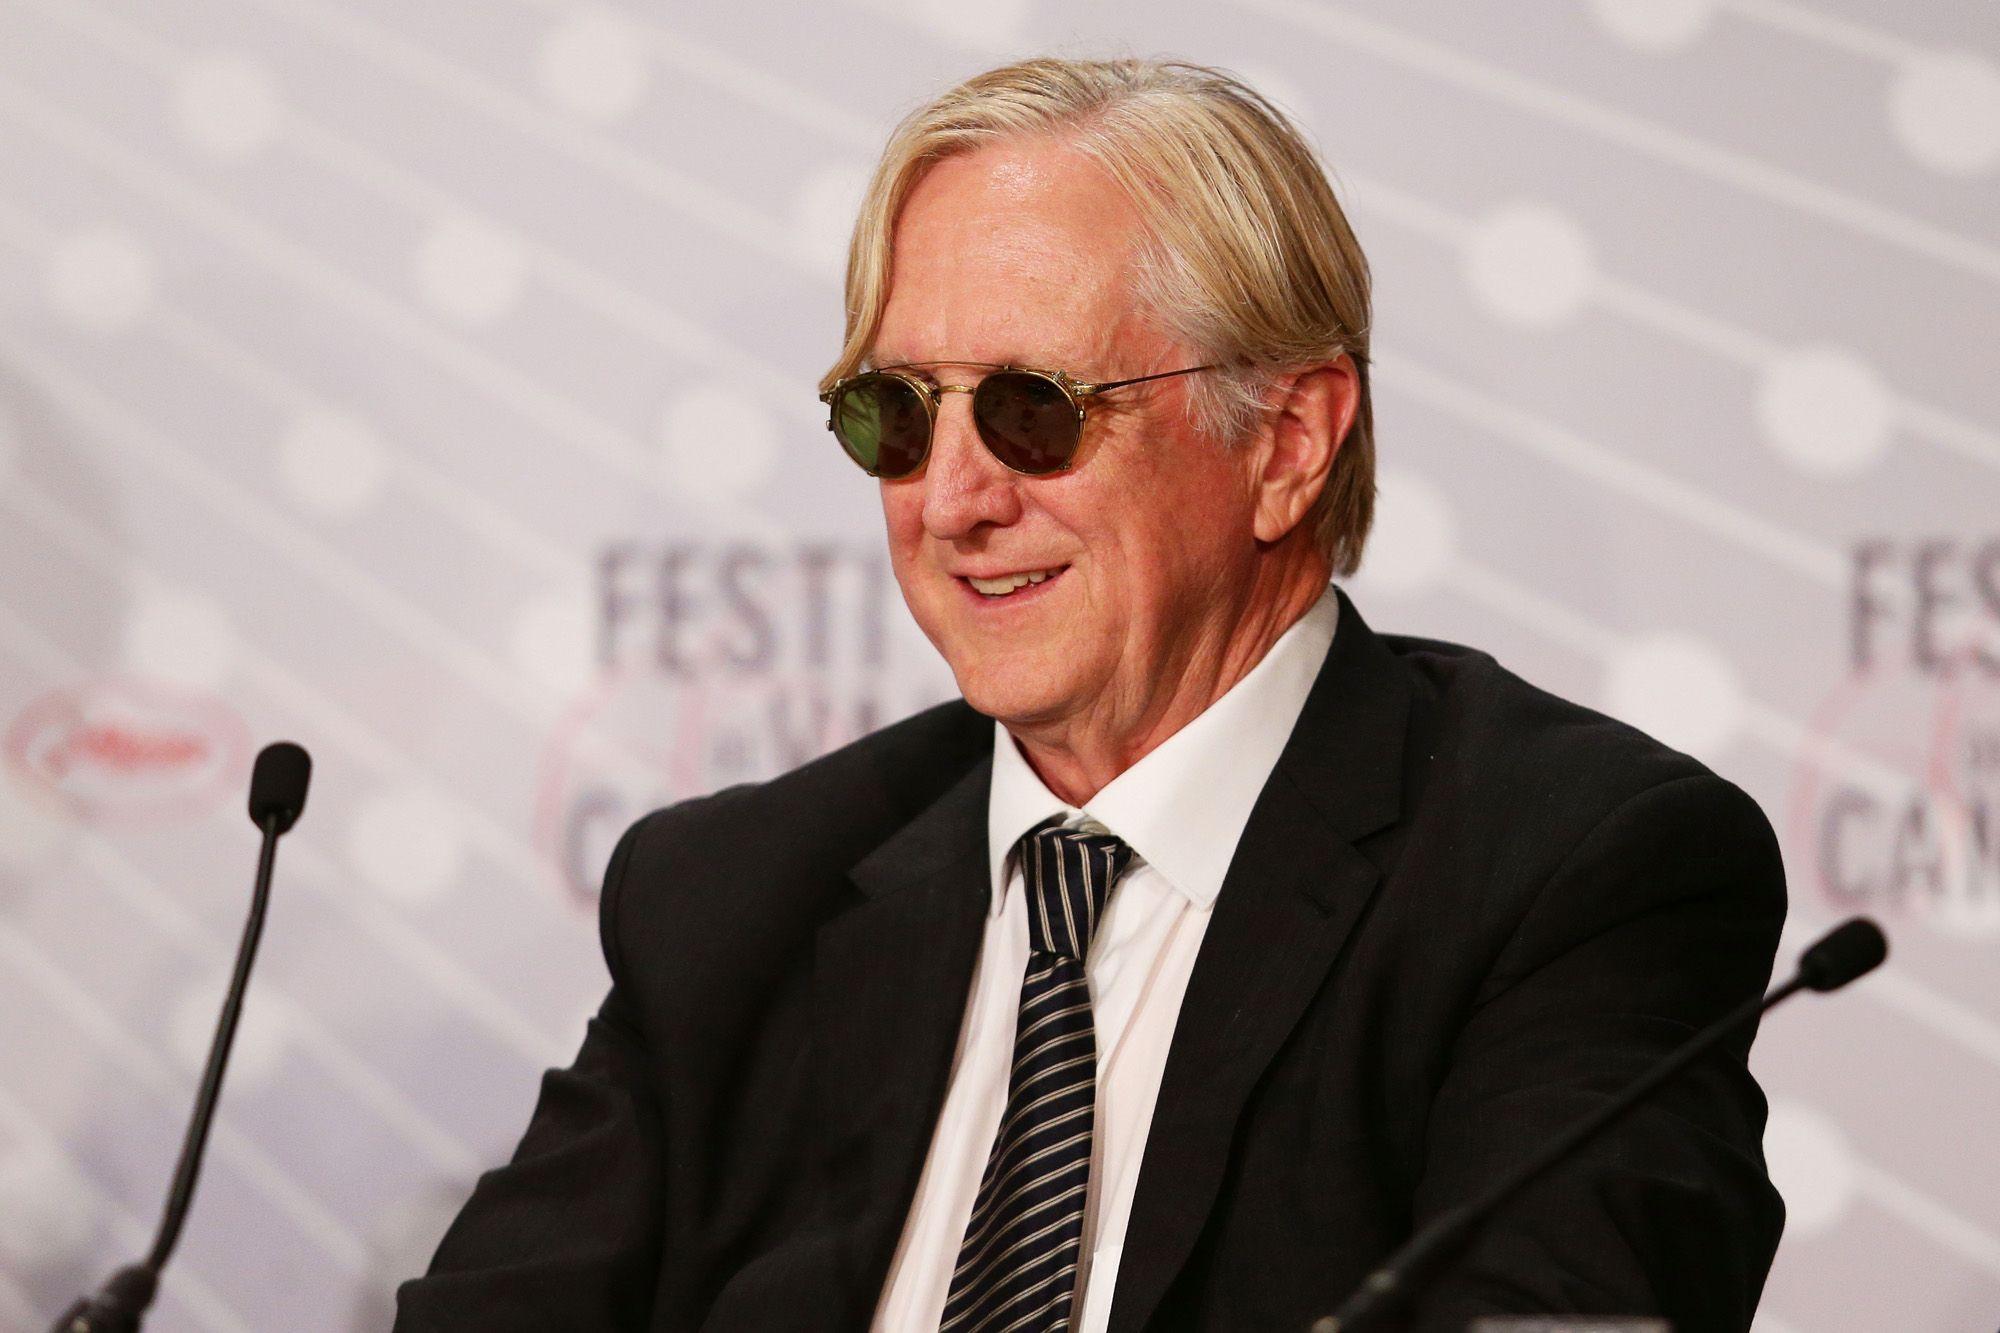 'Inside Llewyn Davis' Press Conference - The 66th Annual Cannes Film Festival